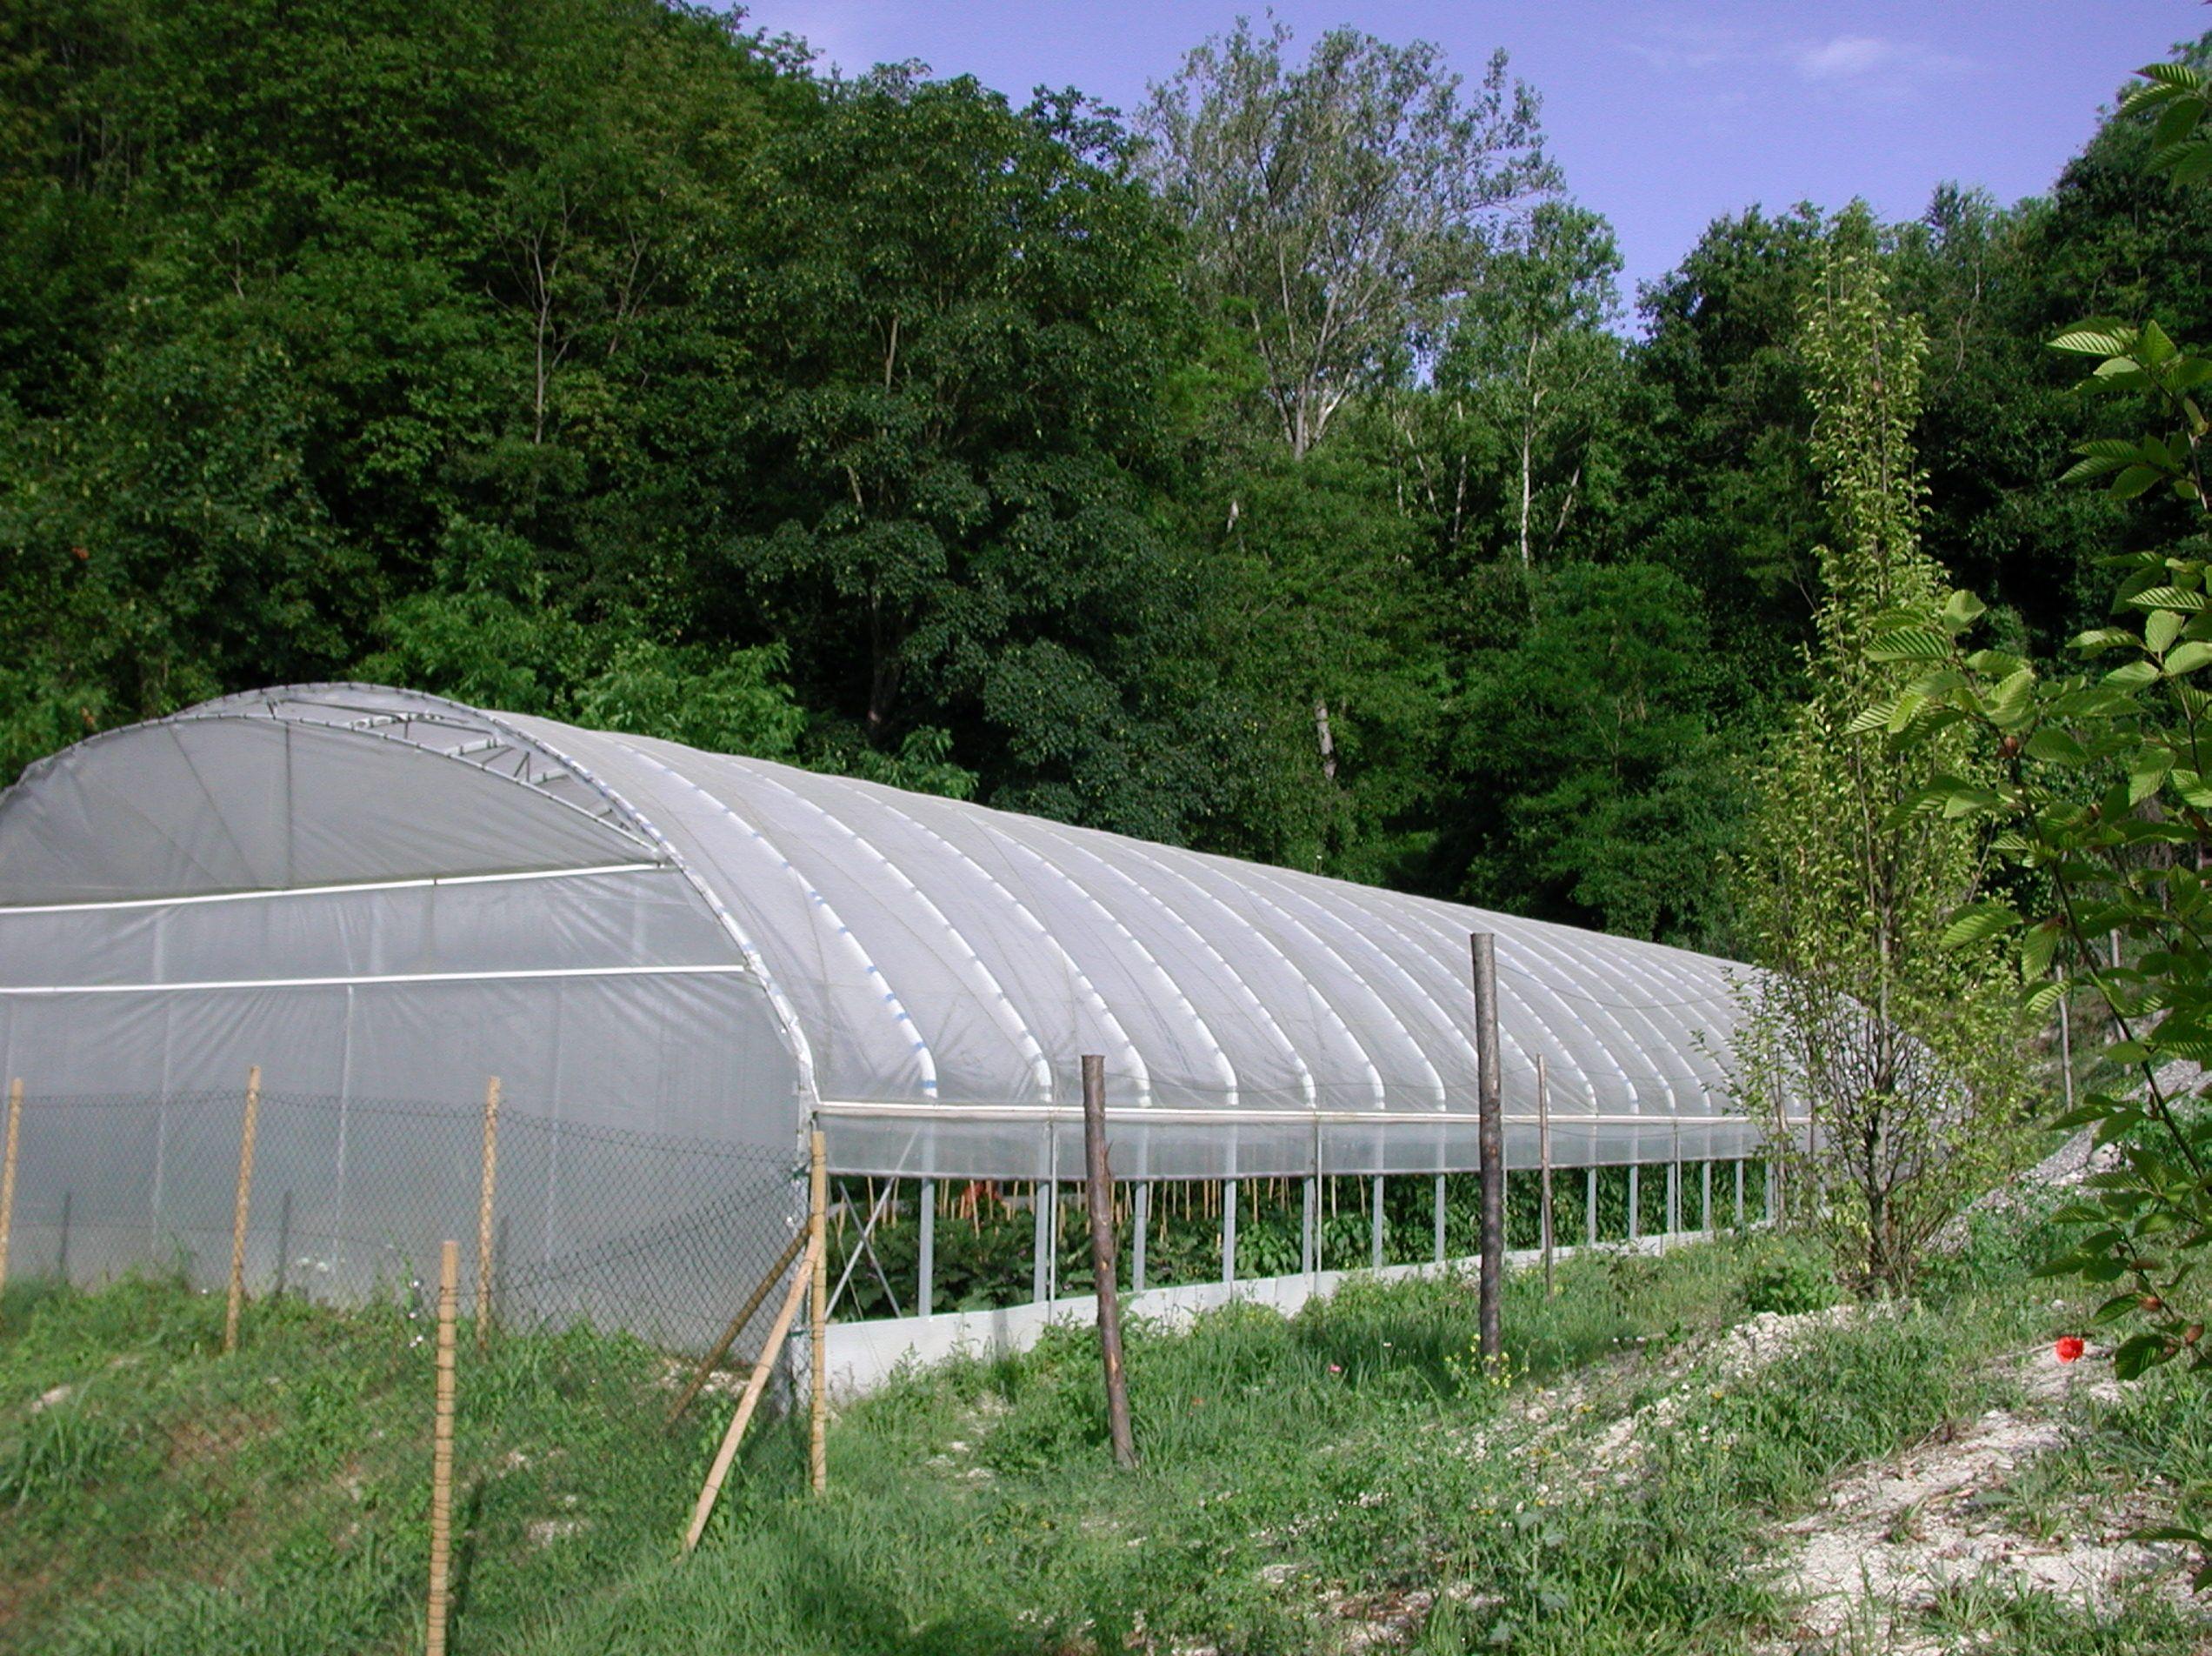 Costruire Una Mini Serra Riscaldata la nostra serra riscaldata. | serra, esterno e fiori